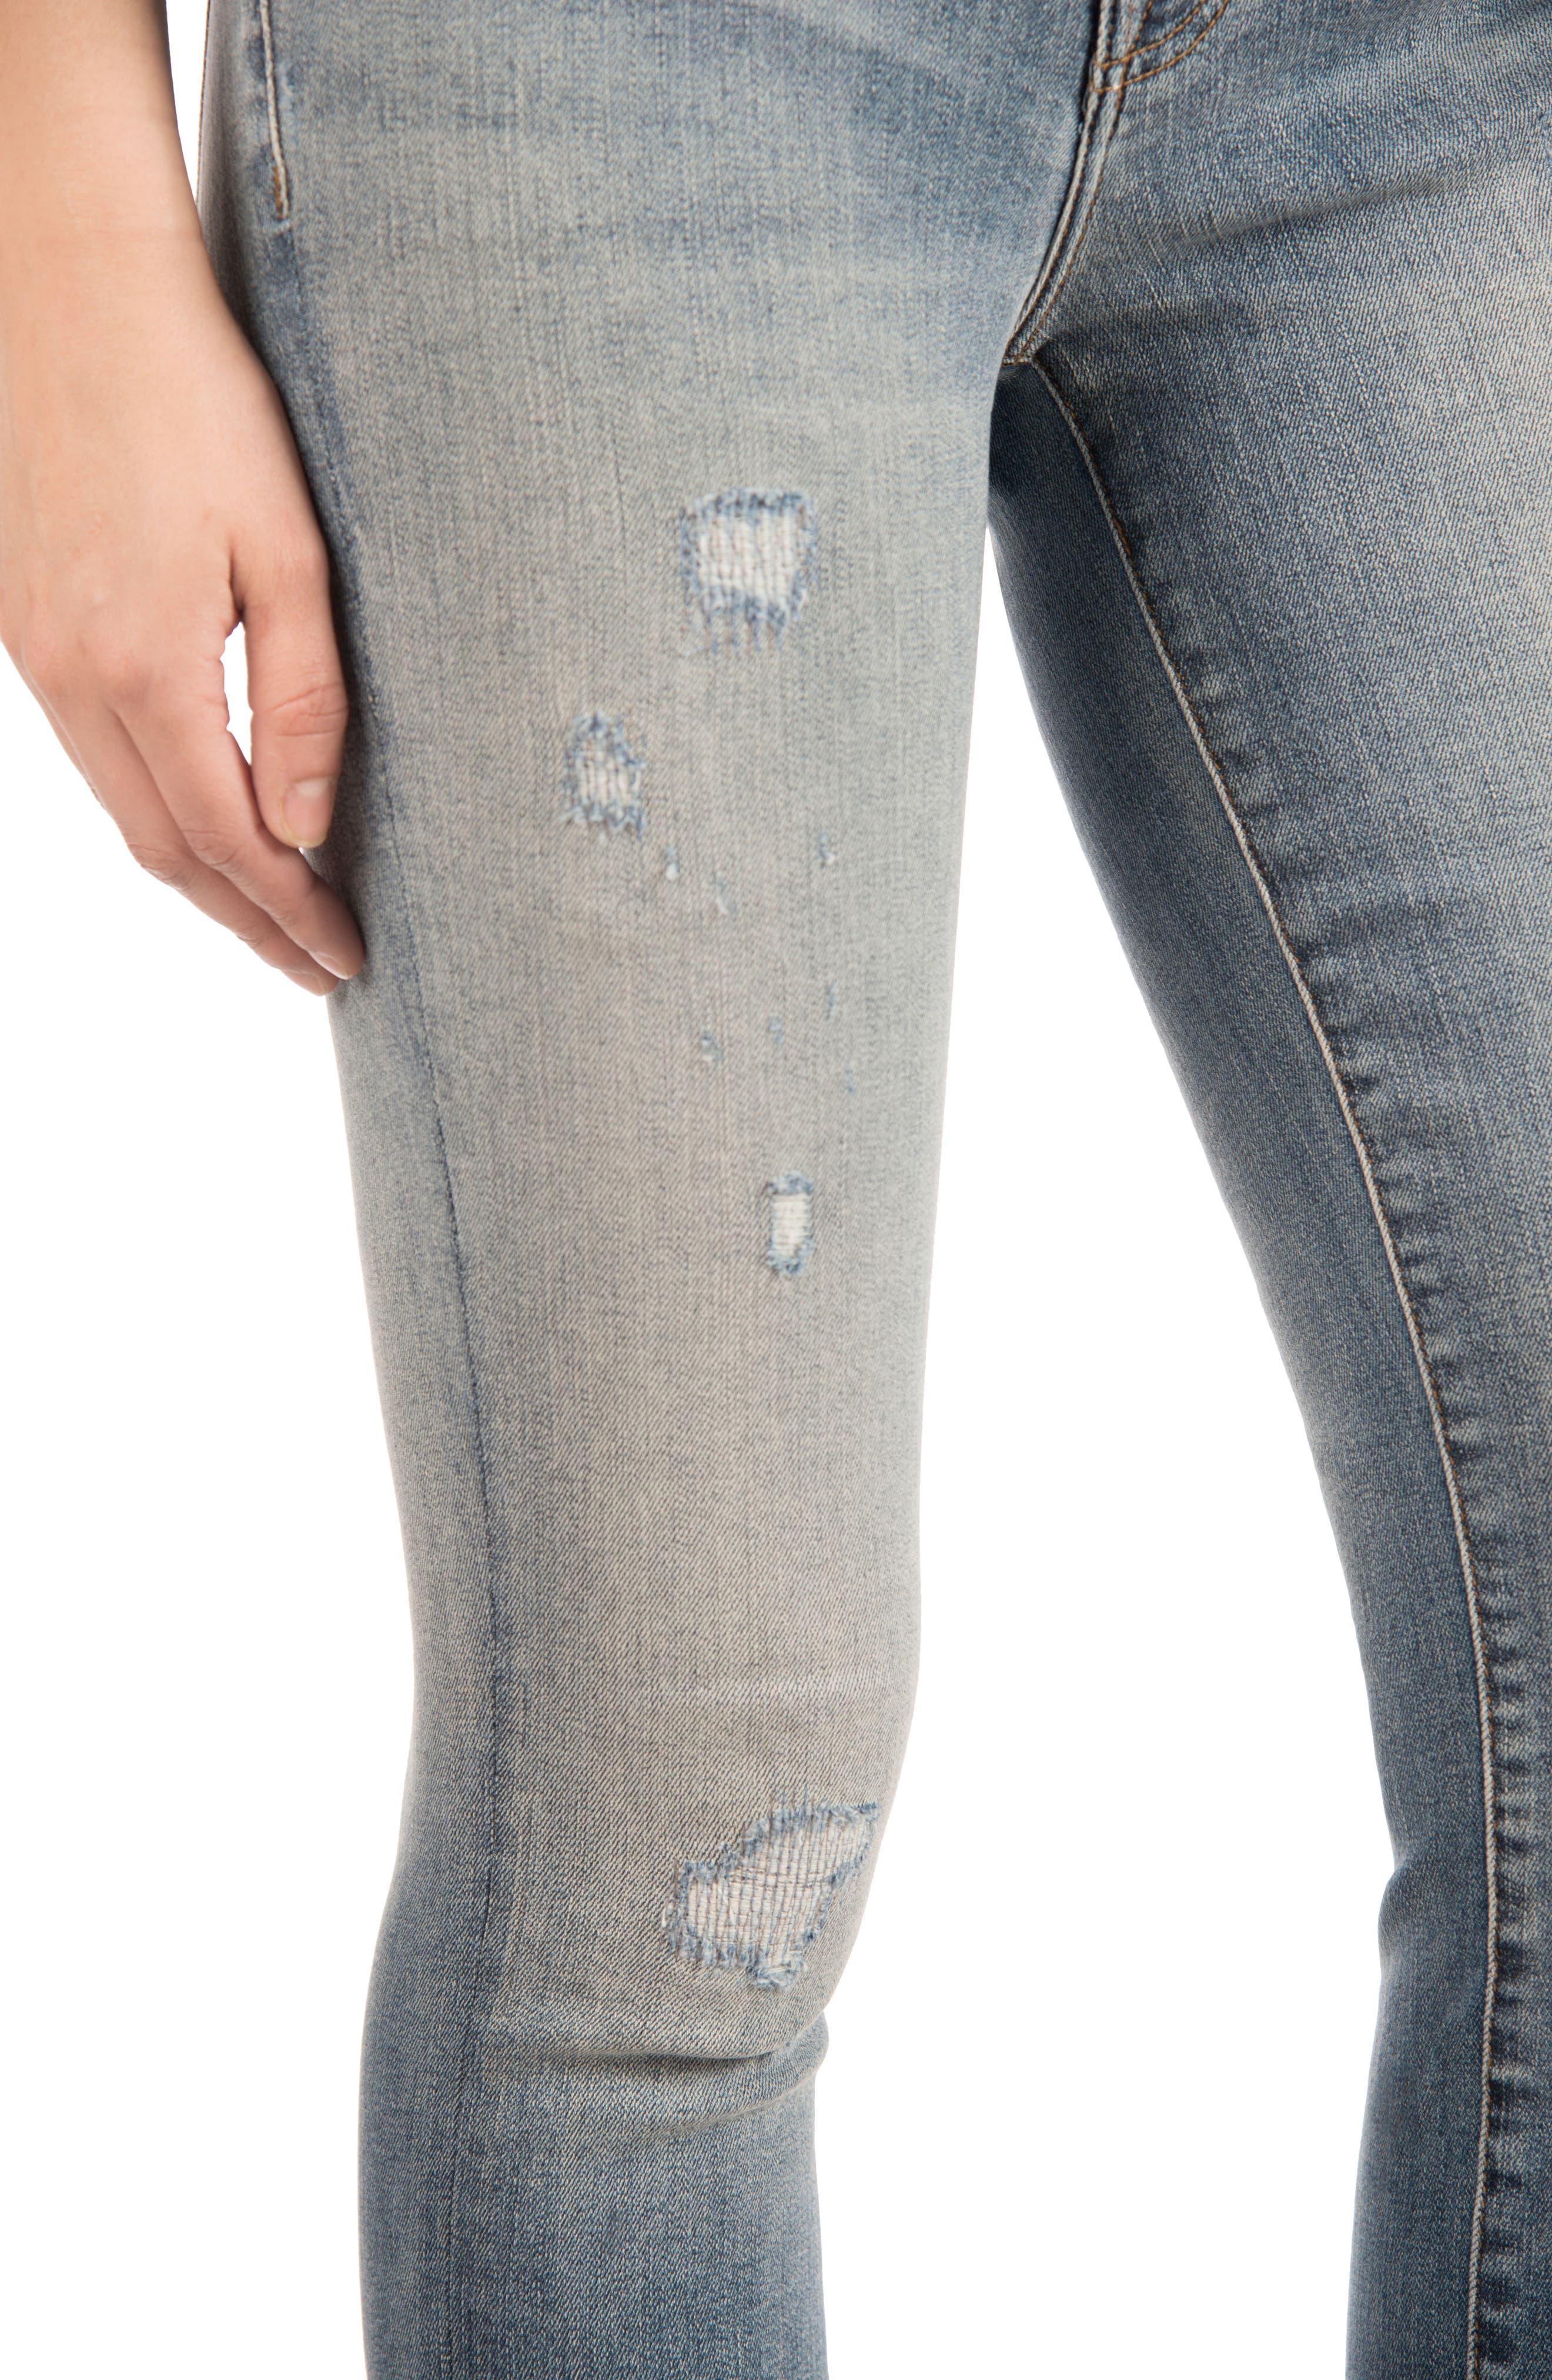 835 Distressed Capri Skinny Jeans,                             Alternate thumbnail 4, color,                             Nolita